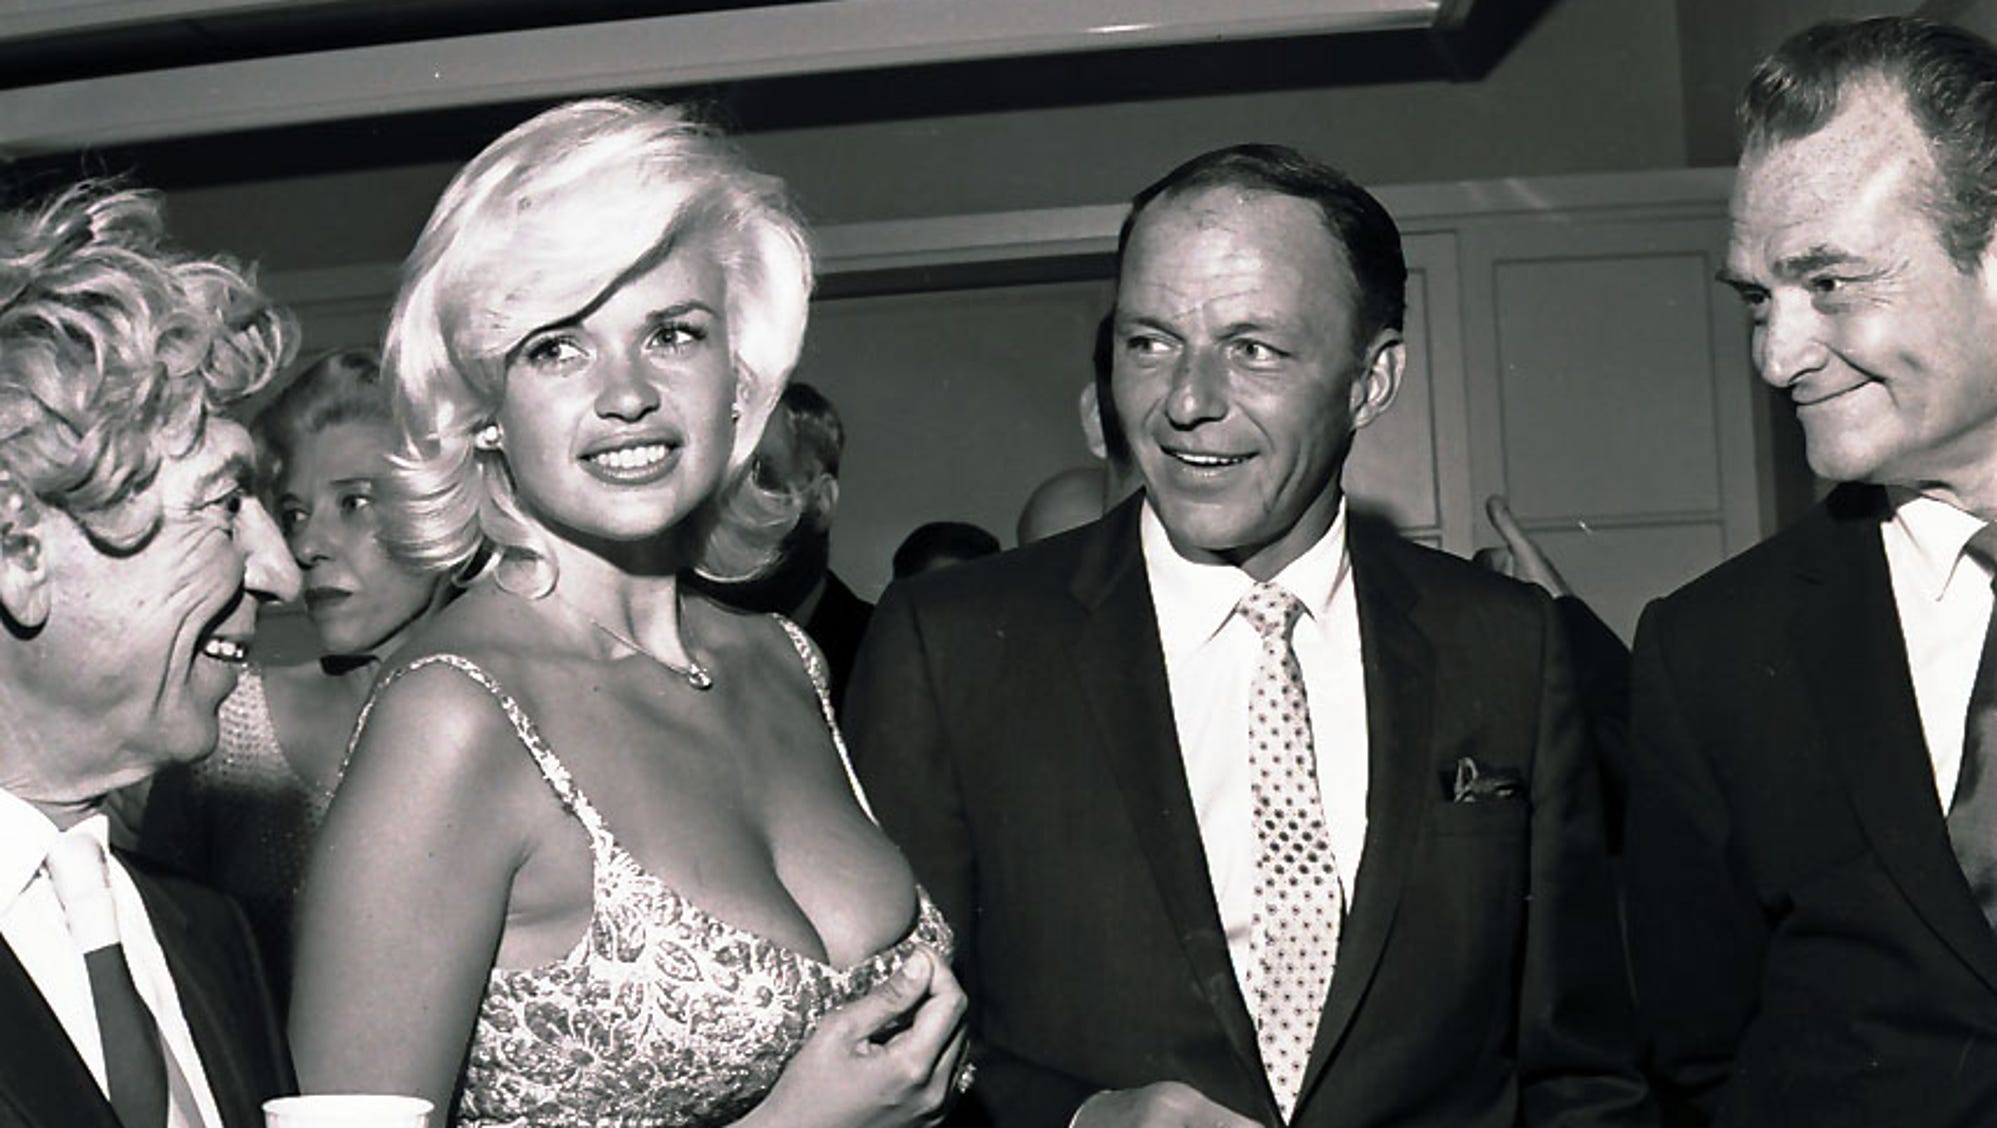 http://www.gannett-cdn.com/-mm-/b172c7e42118953bdd3beaf839cbb6aa3d9c21ba/c=0-197-857-681&r=x1128&c=2000x1125/local/-/media/PalmSprings/PalmSprings/2014/11/25/635525266743645046-Sinatra02.JPG